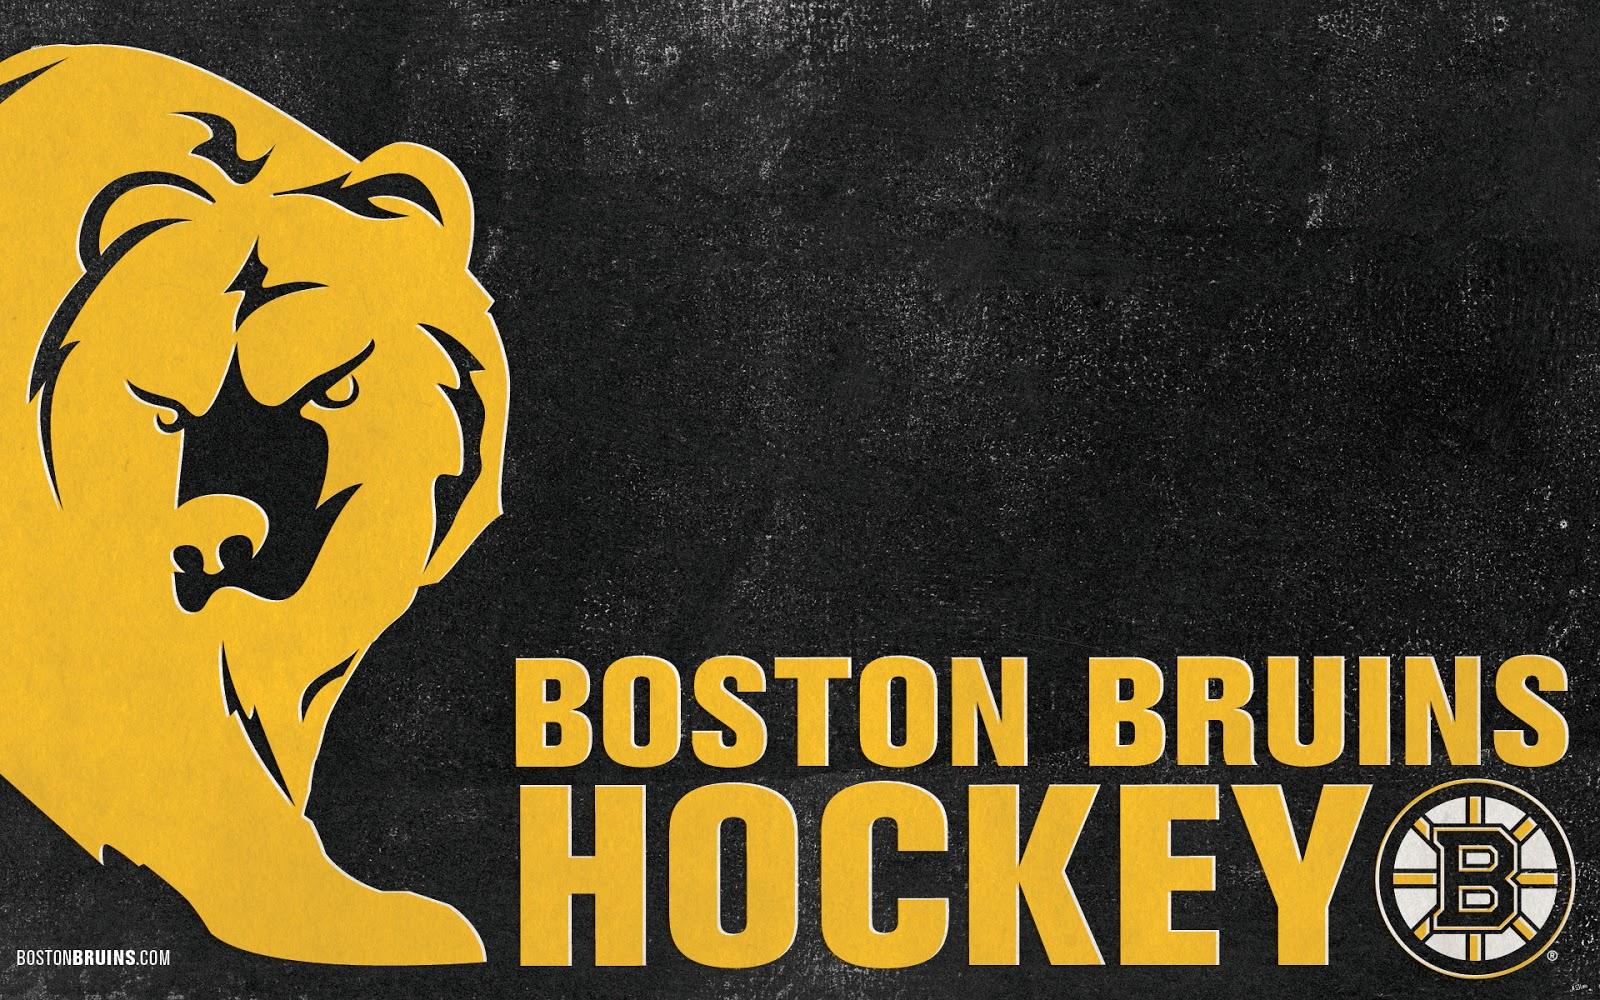 News Top Wallpaper: Boston Bruins HockeyBruins News